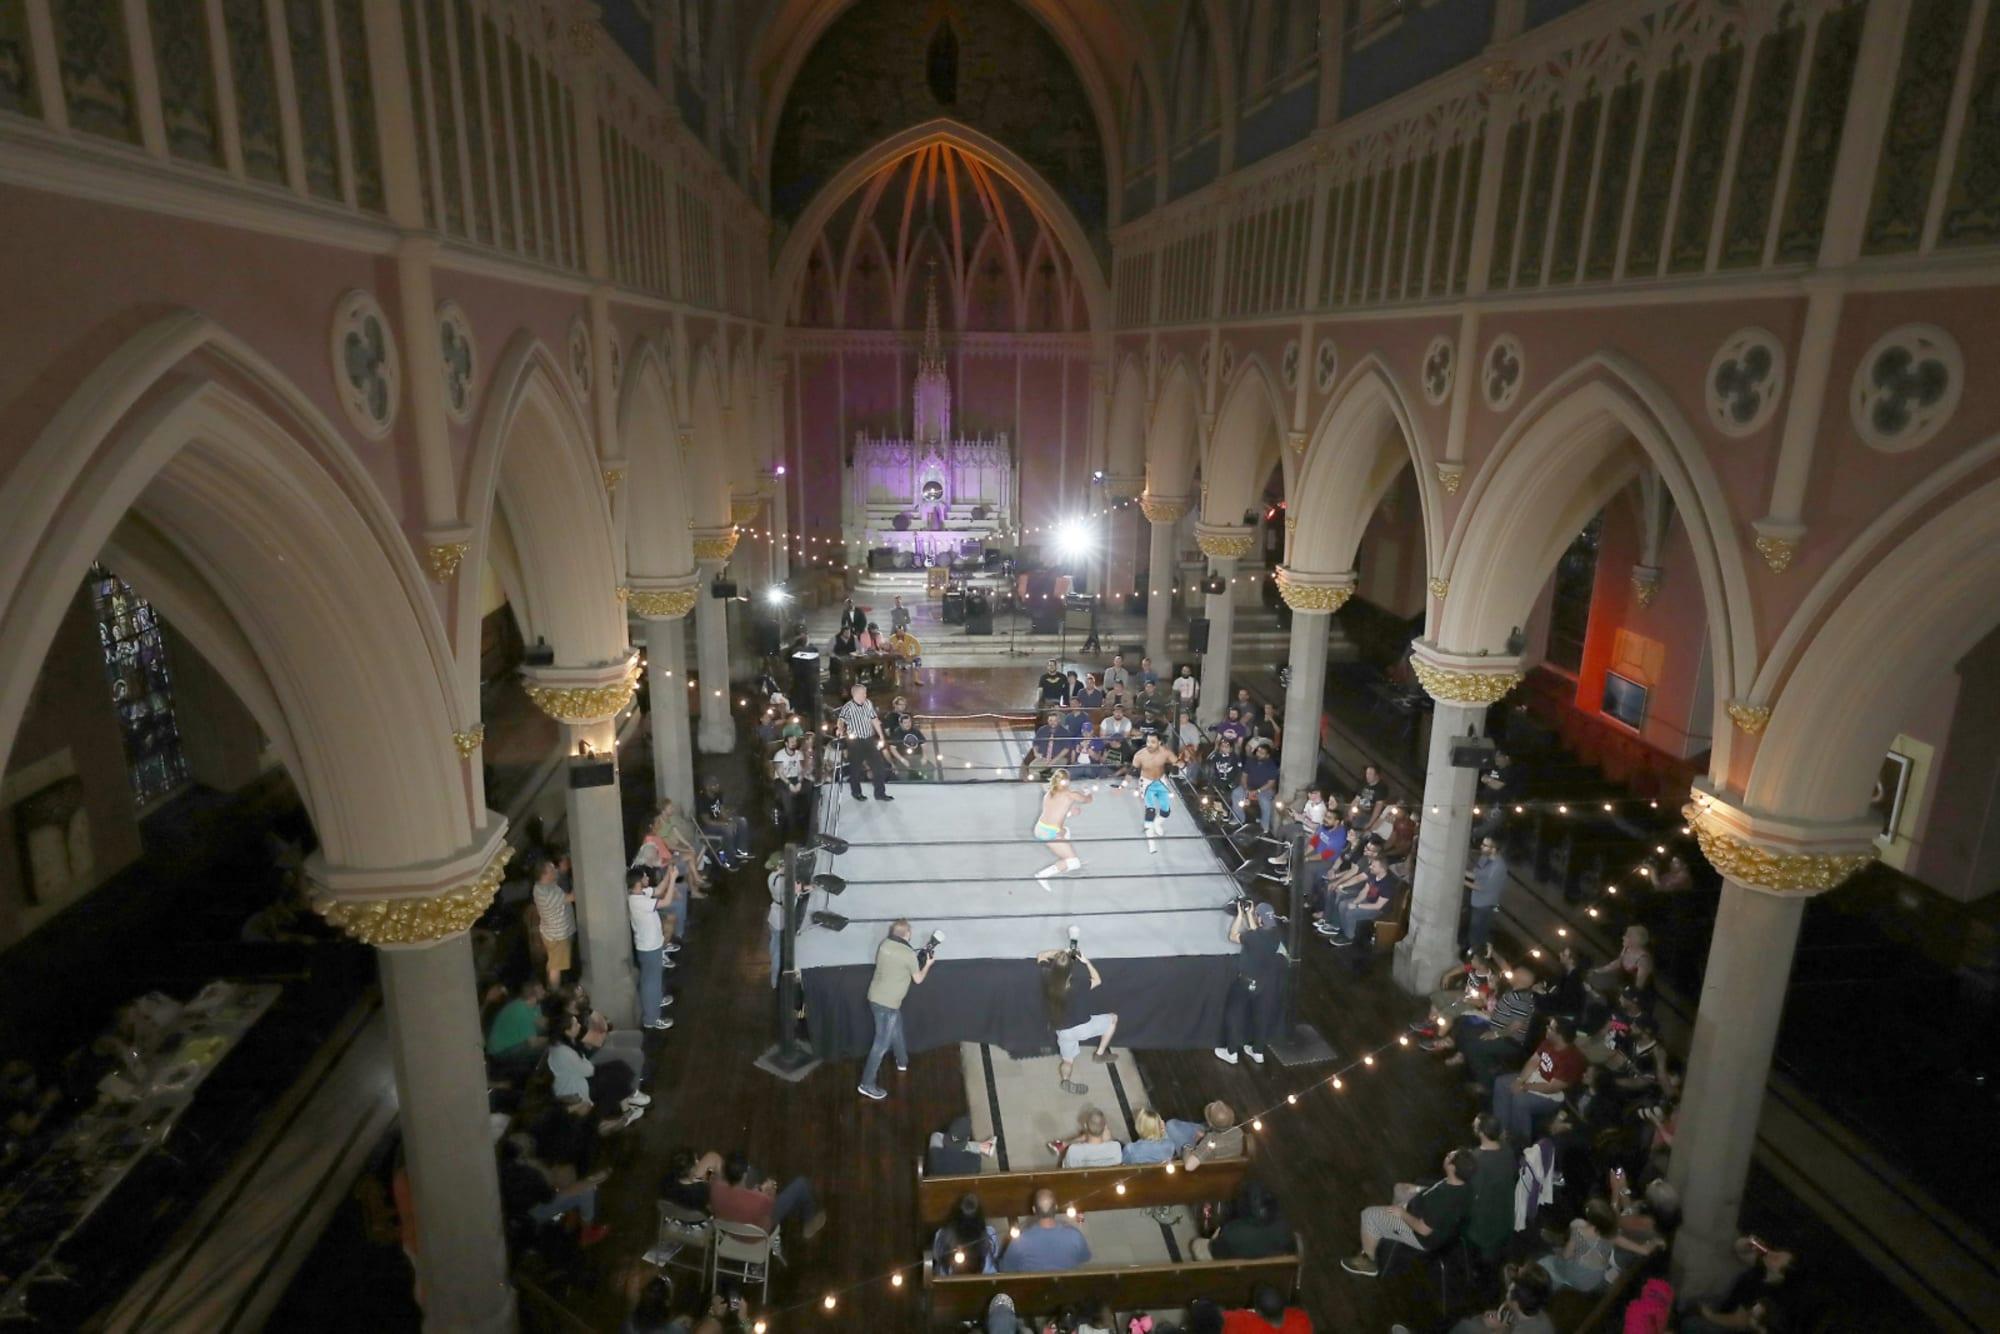 Dark Sheik on industry progress, The Church of Wrestling, EFFY's BGB, and more